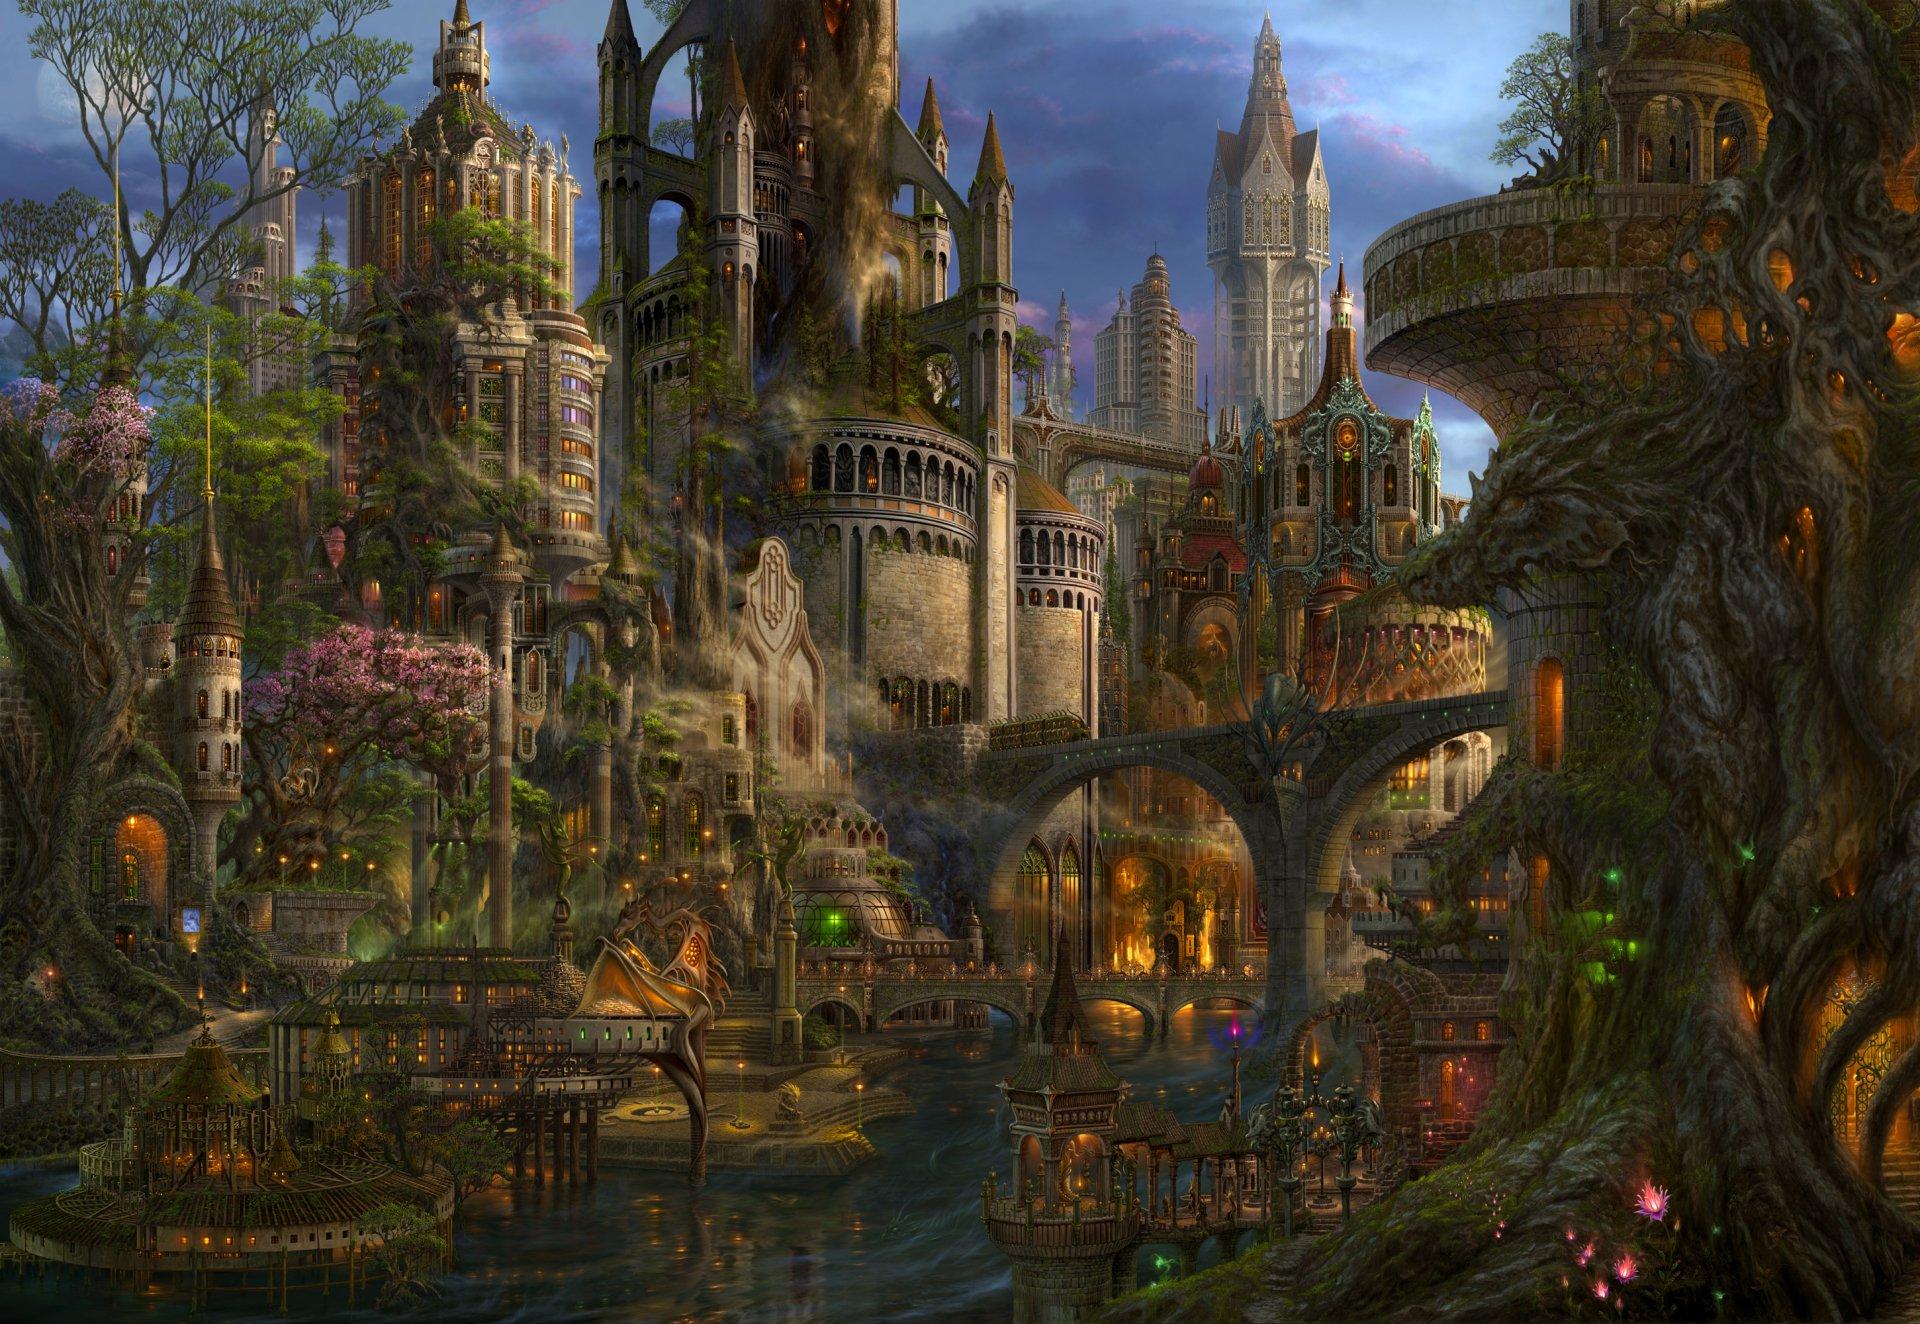 Anime - Original  Anime Landscape Fantasy City Futuristic Colorful Original (Anime) Wallpaper